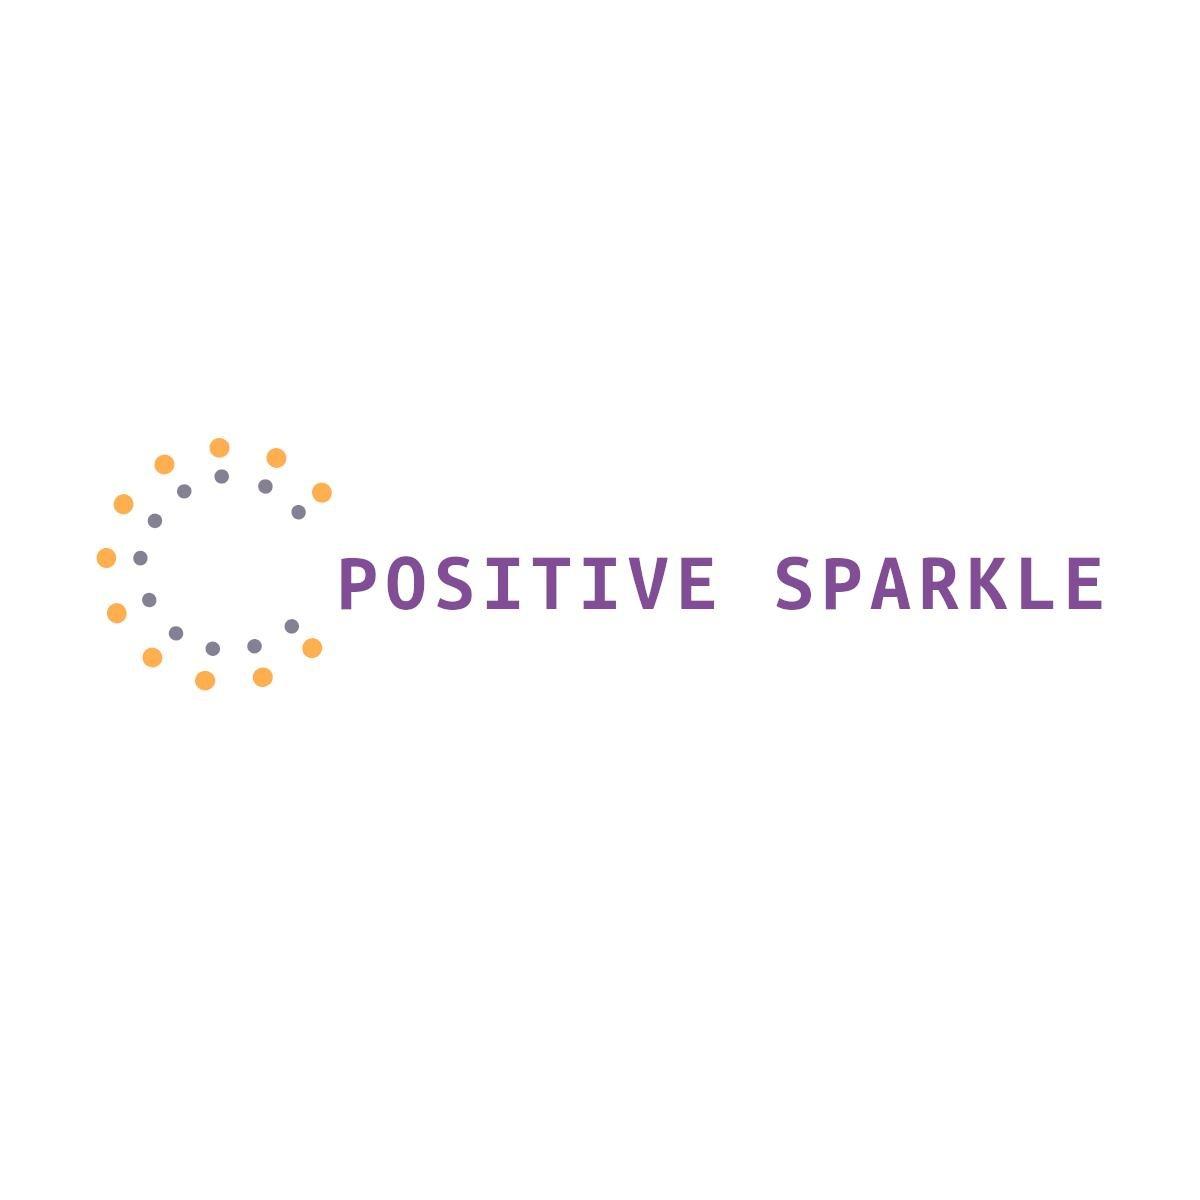 Positive Sparkle